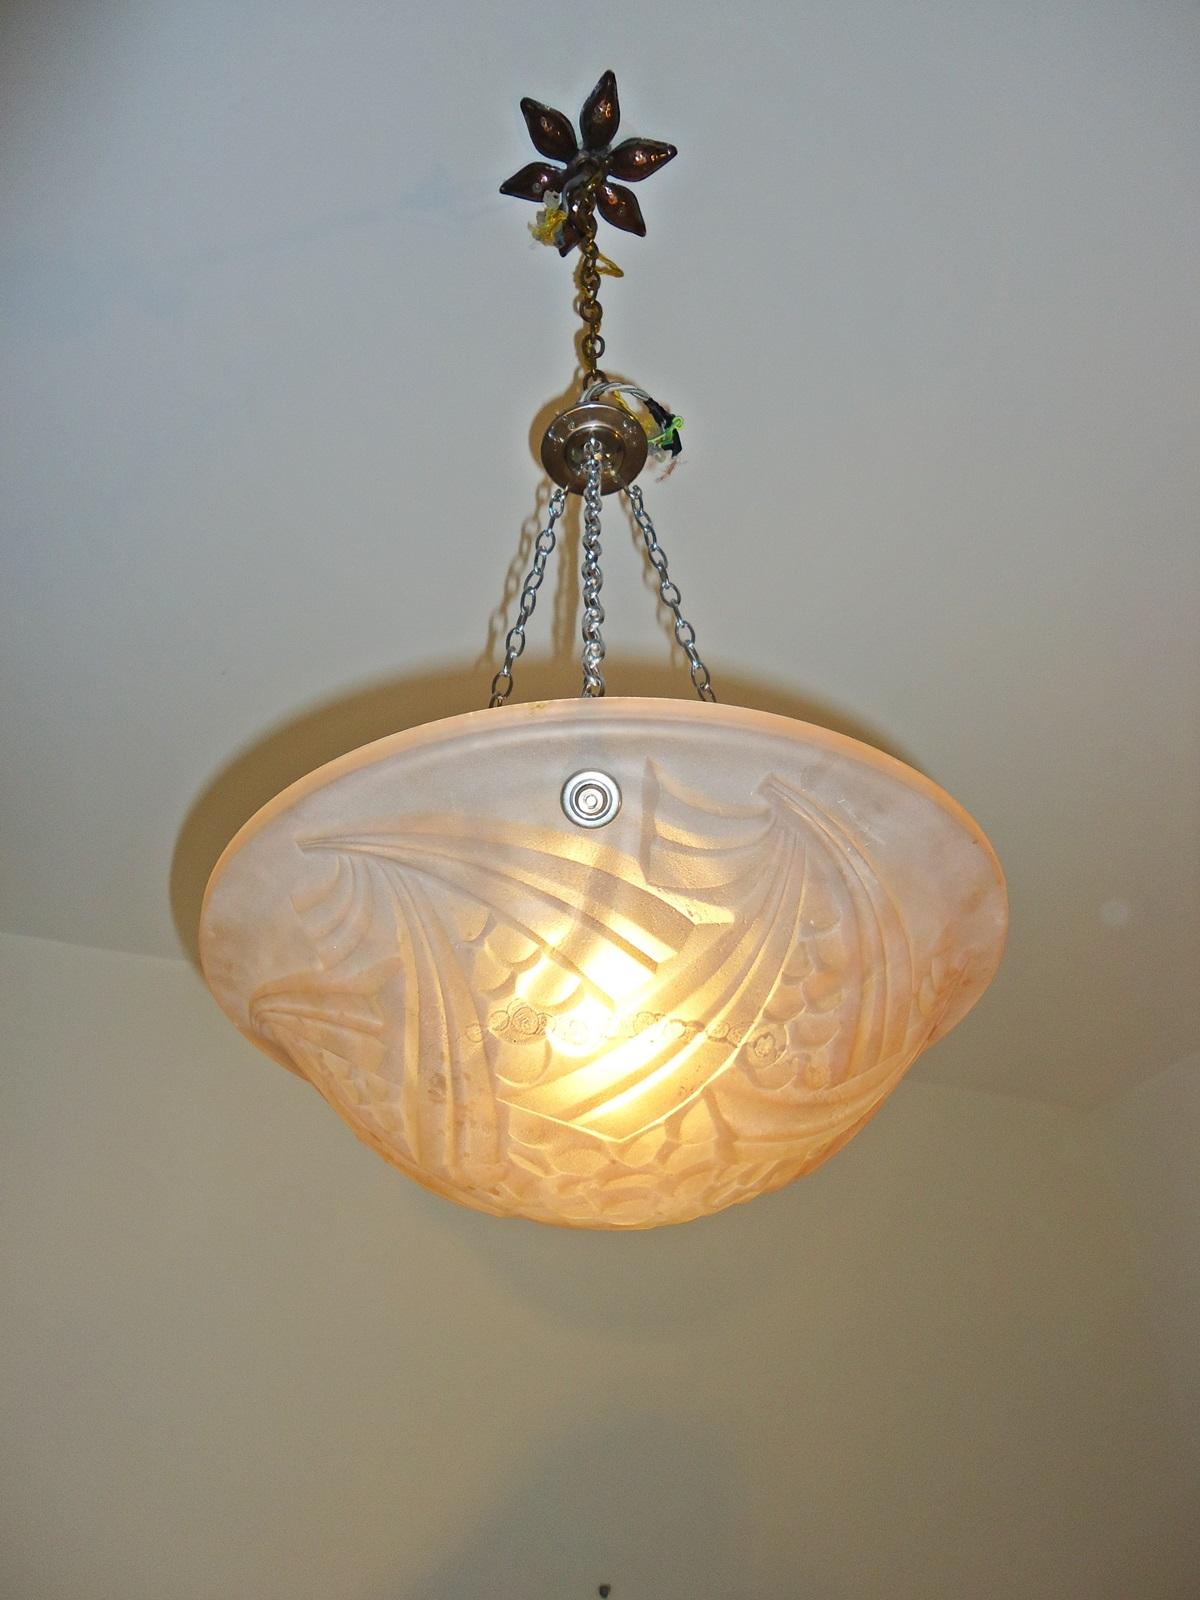 negra art deco plafonnier circa 1930 jones antique lighting. Black Bedroom Furniture Sets. Home Design Ideas